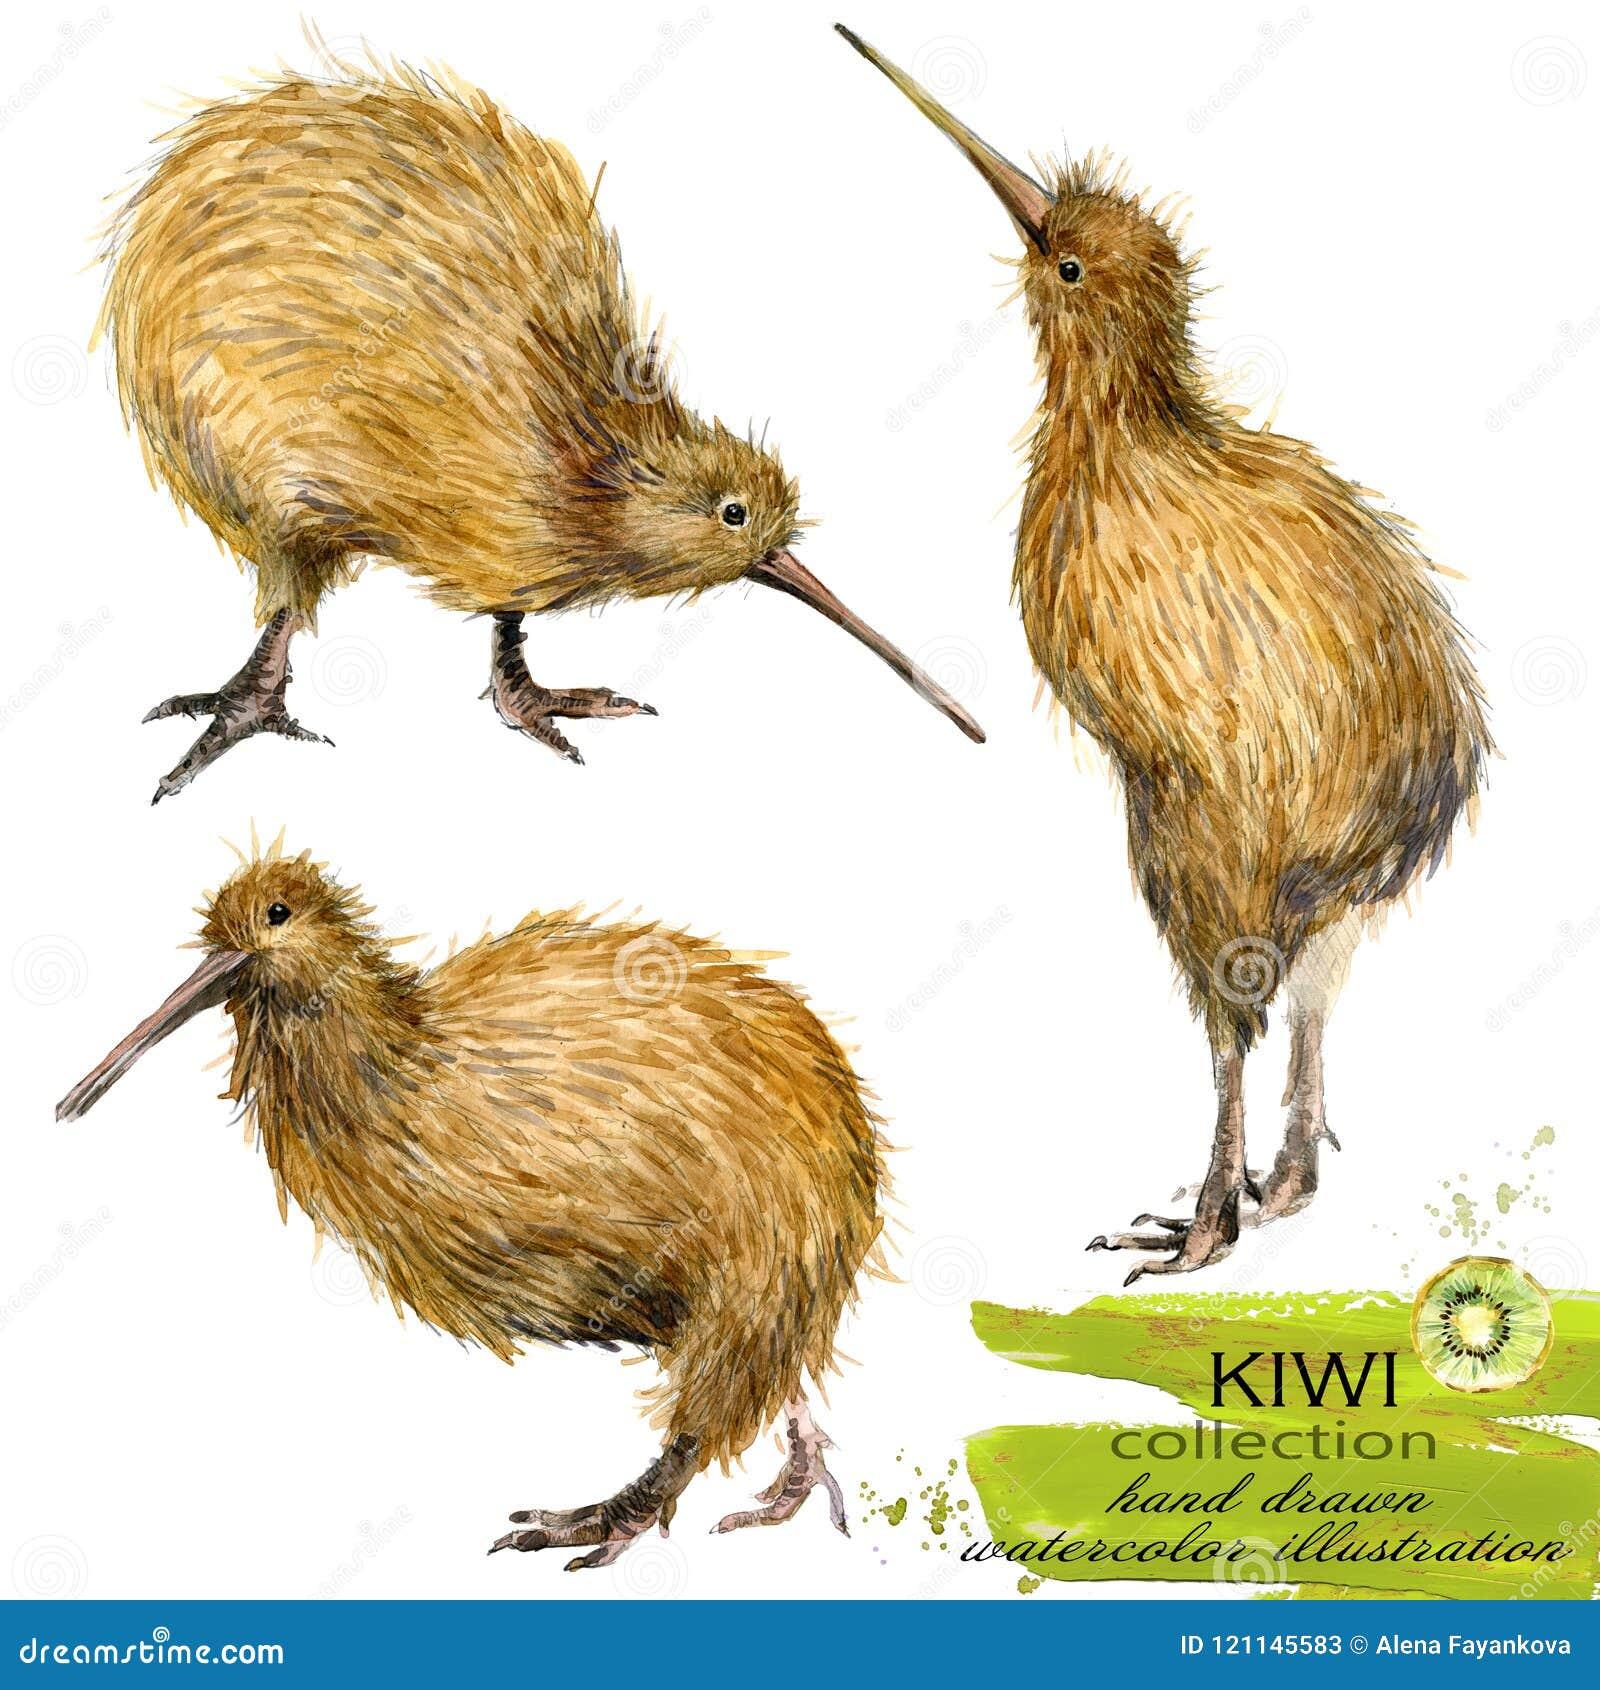 Kiwi Bird Hand Drawn Watercolor Illustration Stock